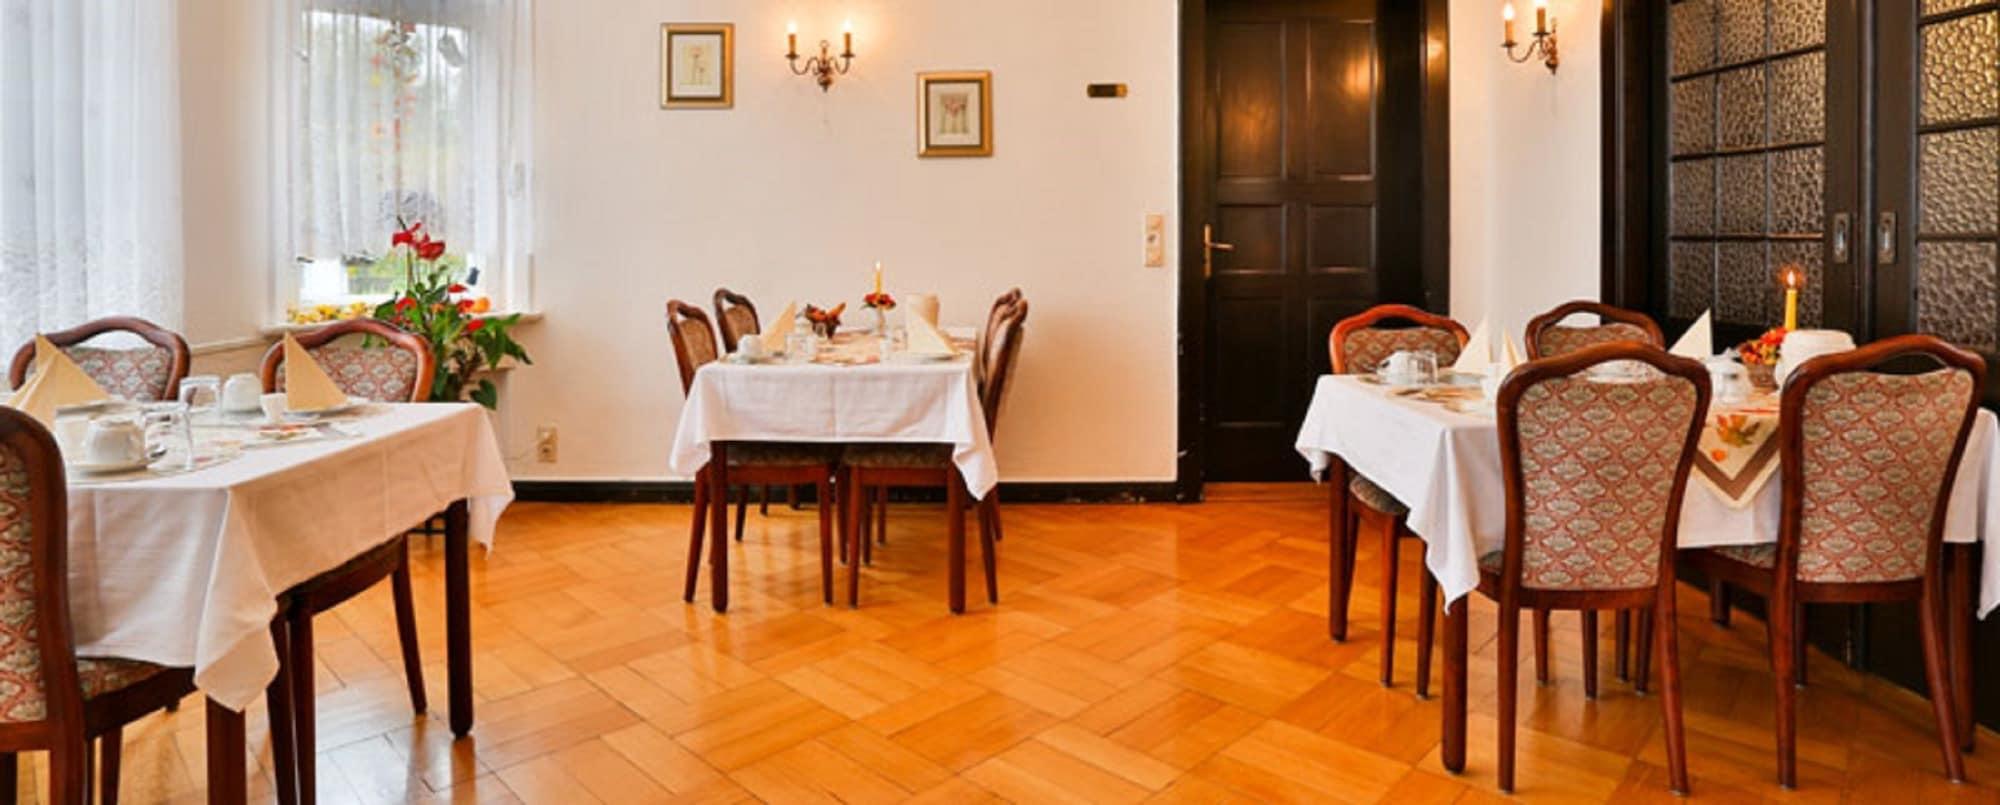 Hotel & Pension Villa Camenz, Rostock